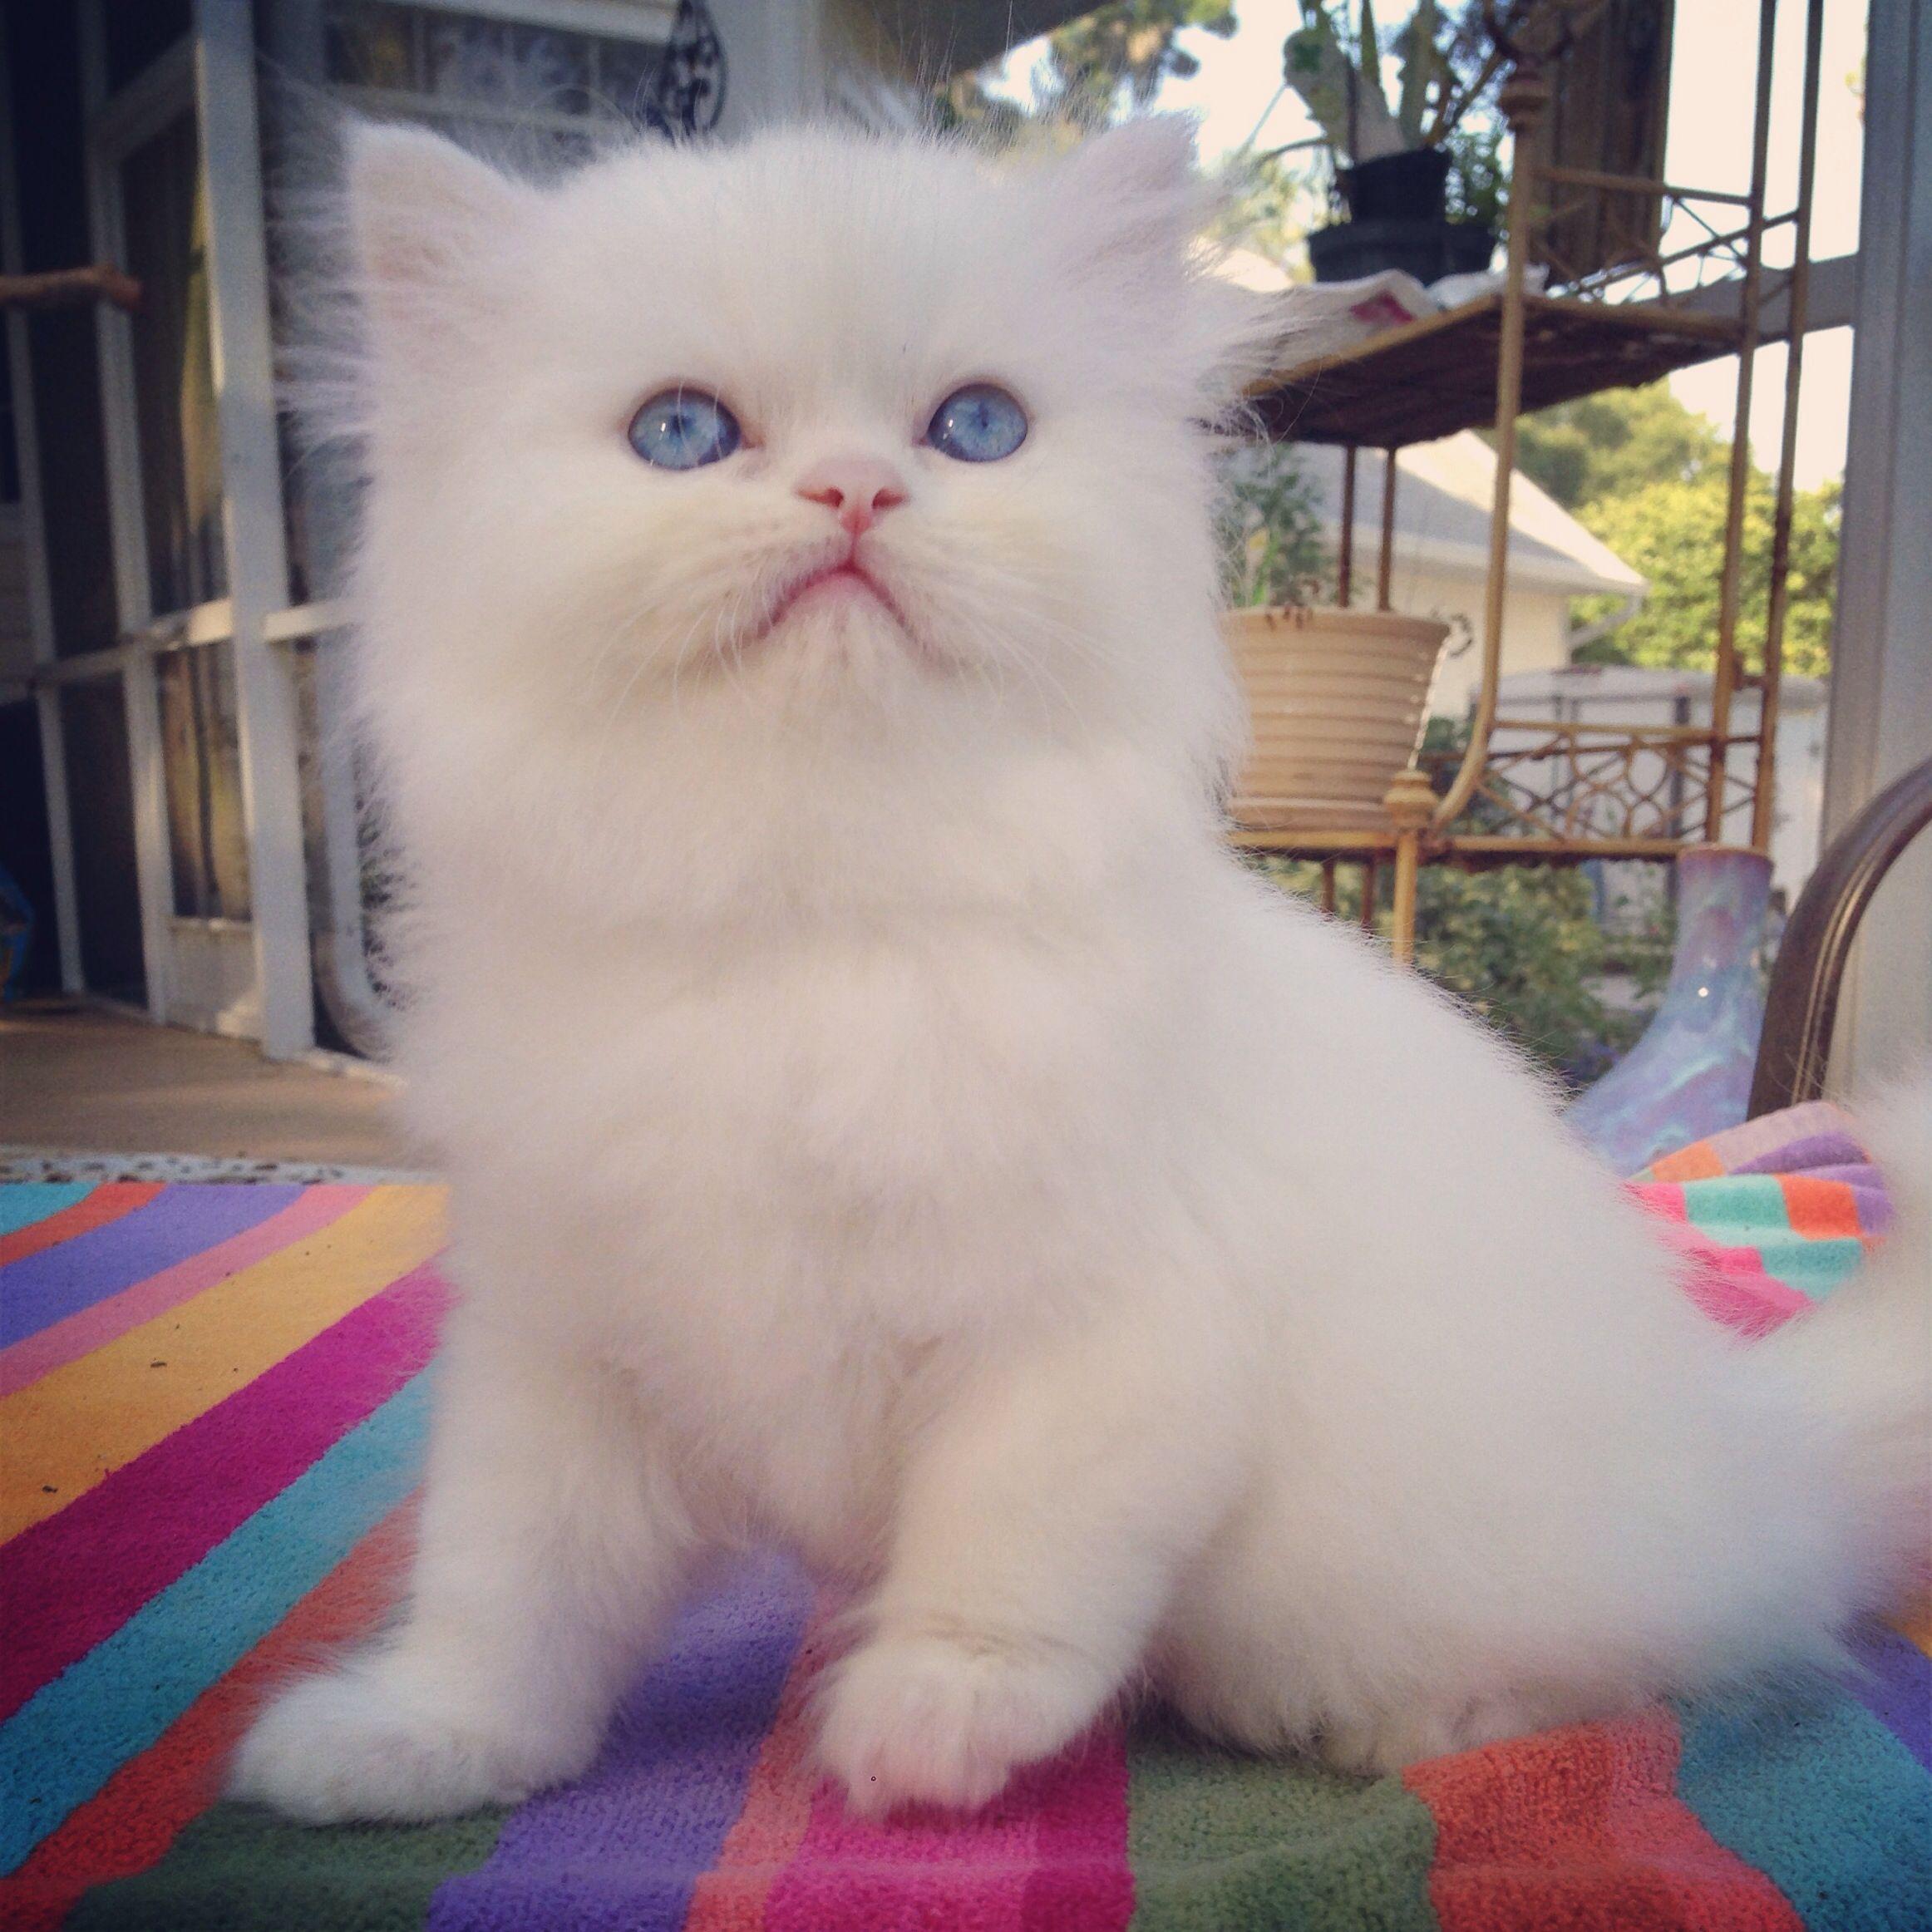 Kismet Kittens We Are Expecting A New Litter Of White Doll Face Persian Kittens Eye Color Will Be Persian Cat Doll Face Teacup Persian Kittens Teacup Kitten